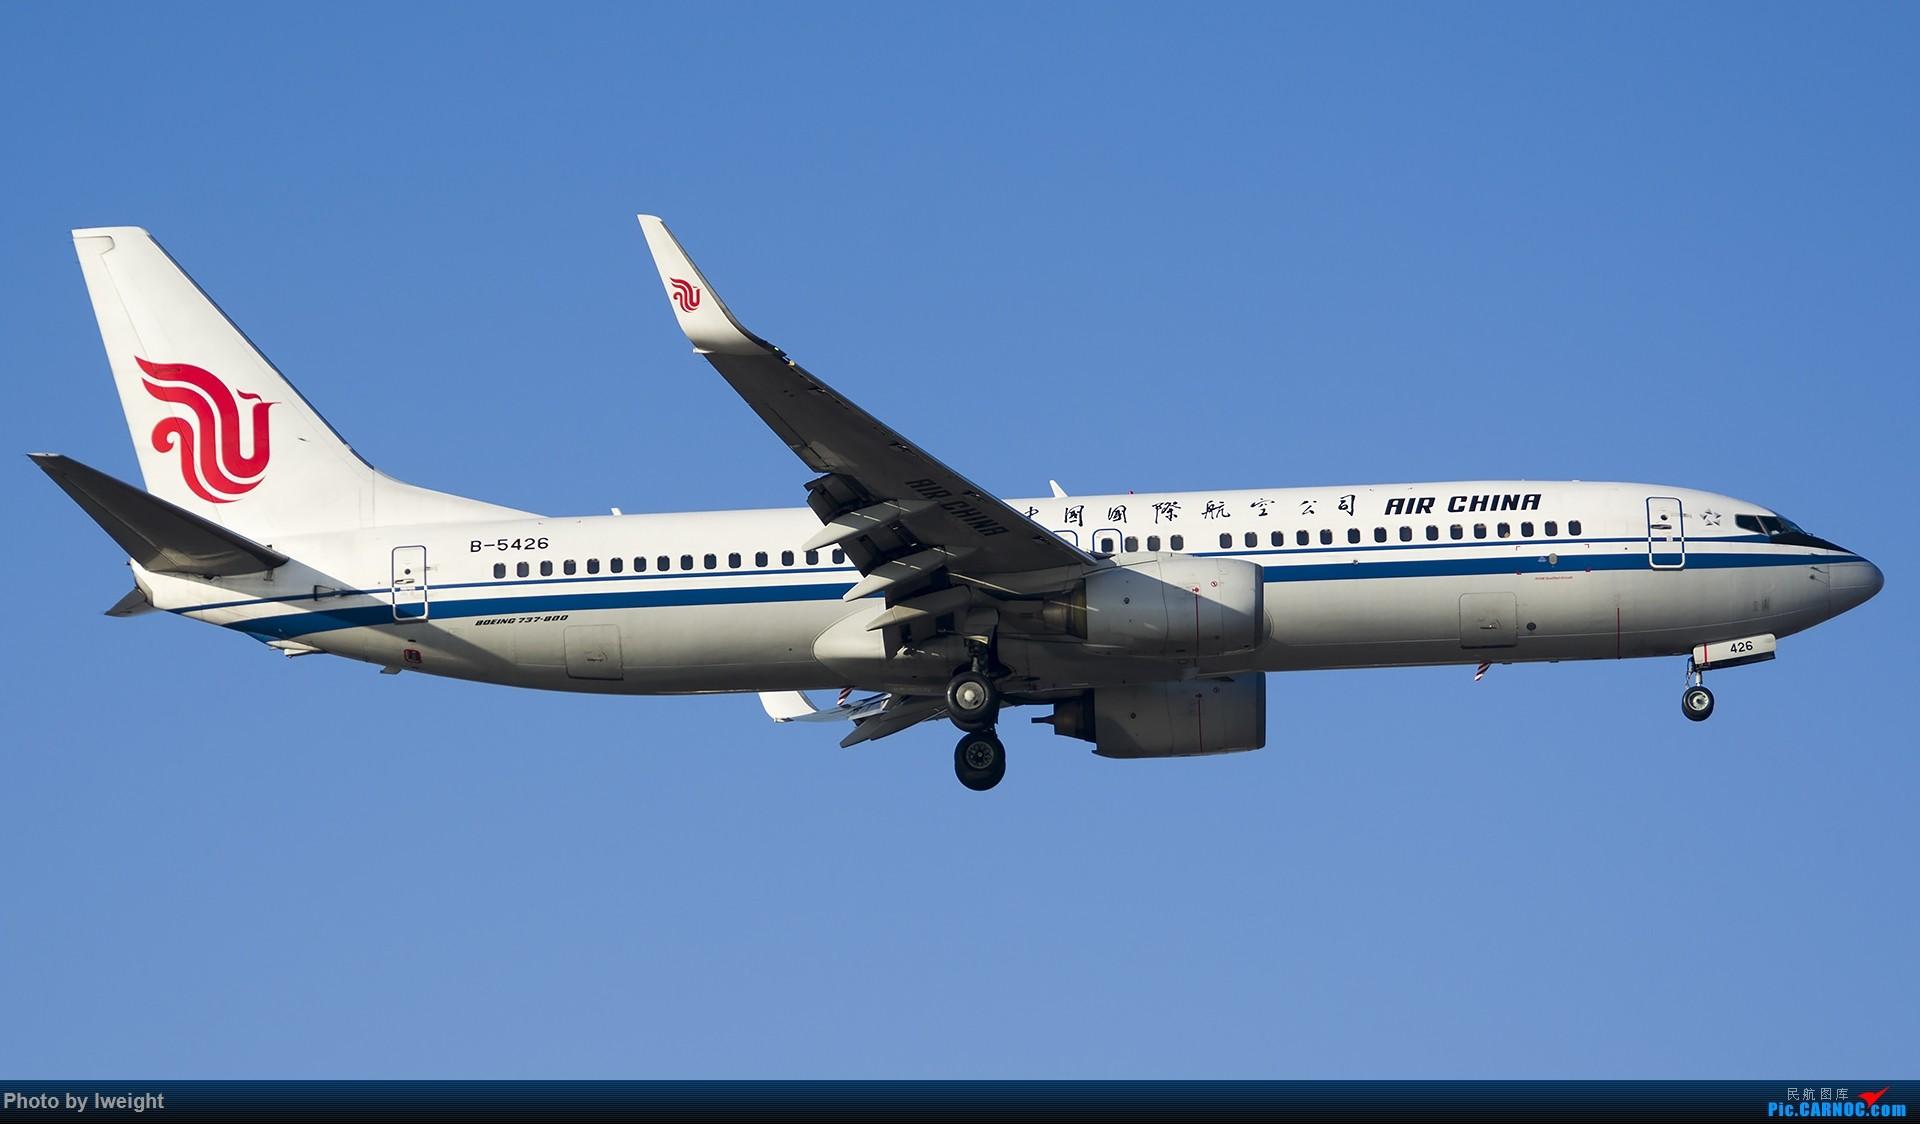 Re:[原创]庆祝升级777,发上今天在首都机场拍的所有飞机【2014-12-14】 BOEING 737-800 B-5426 中国北京首都国际机场